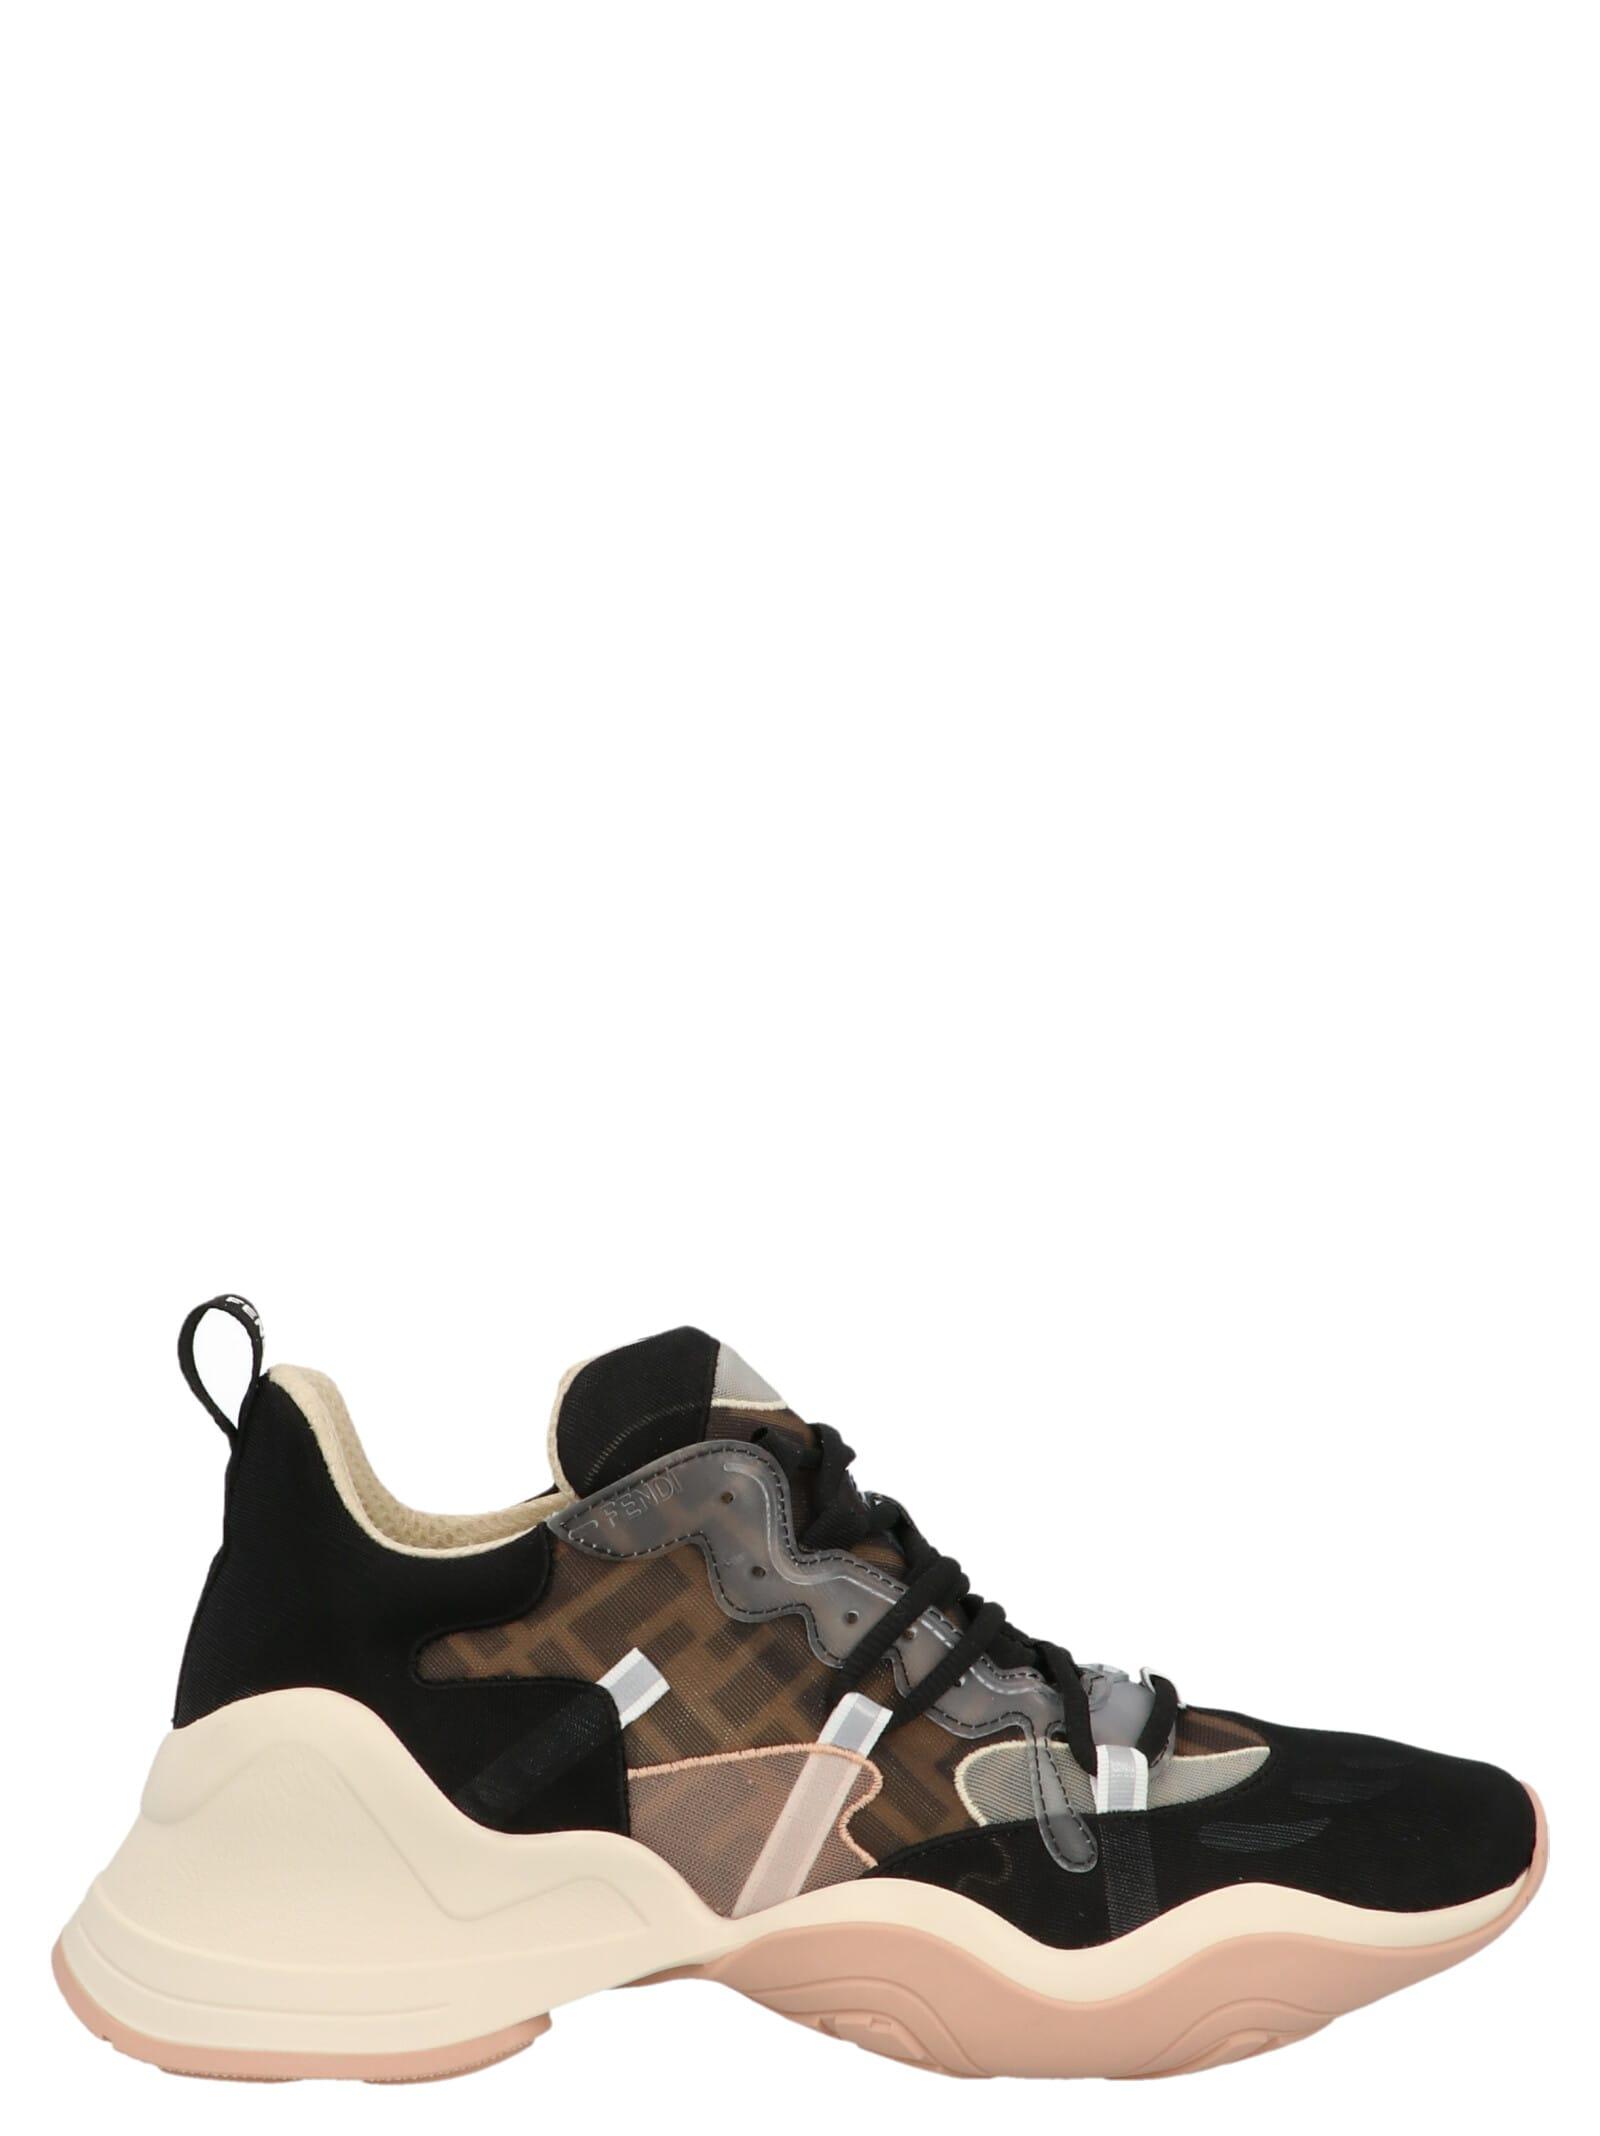 Fendi fluid Shoes